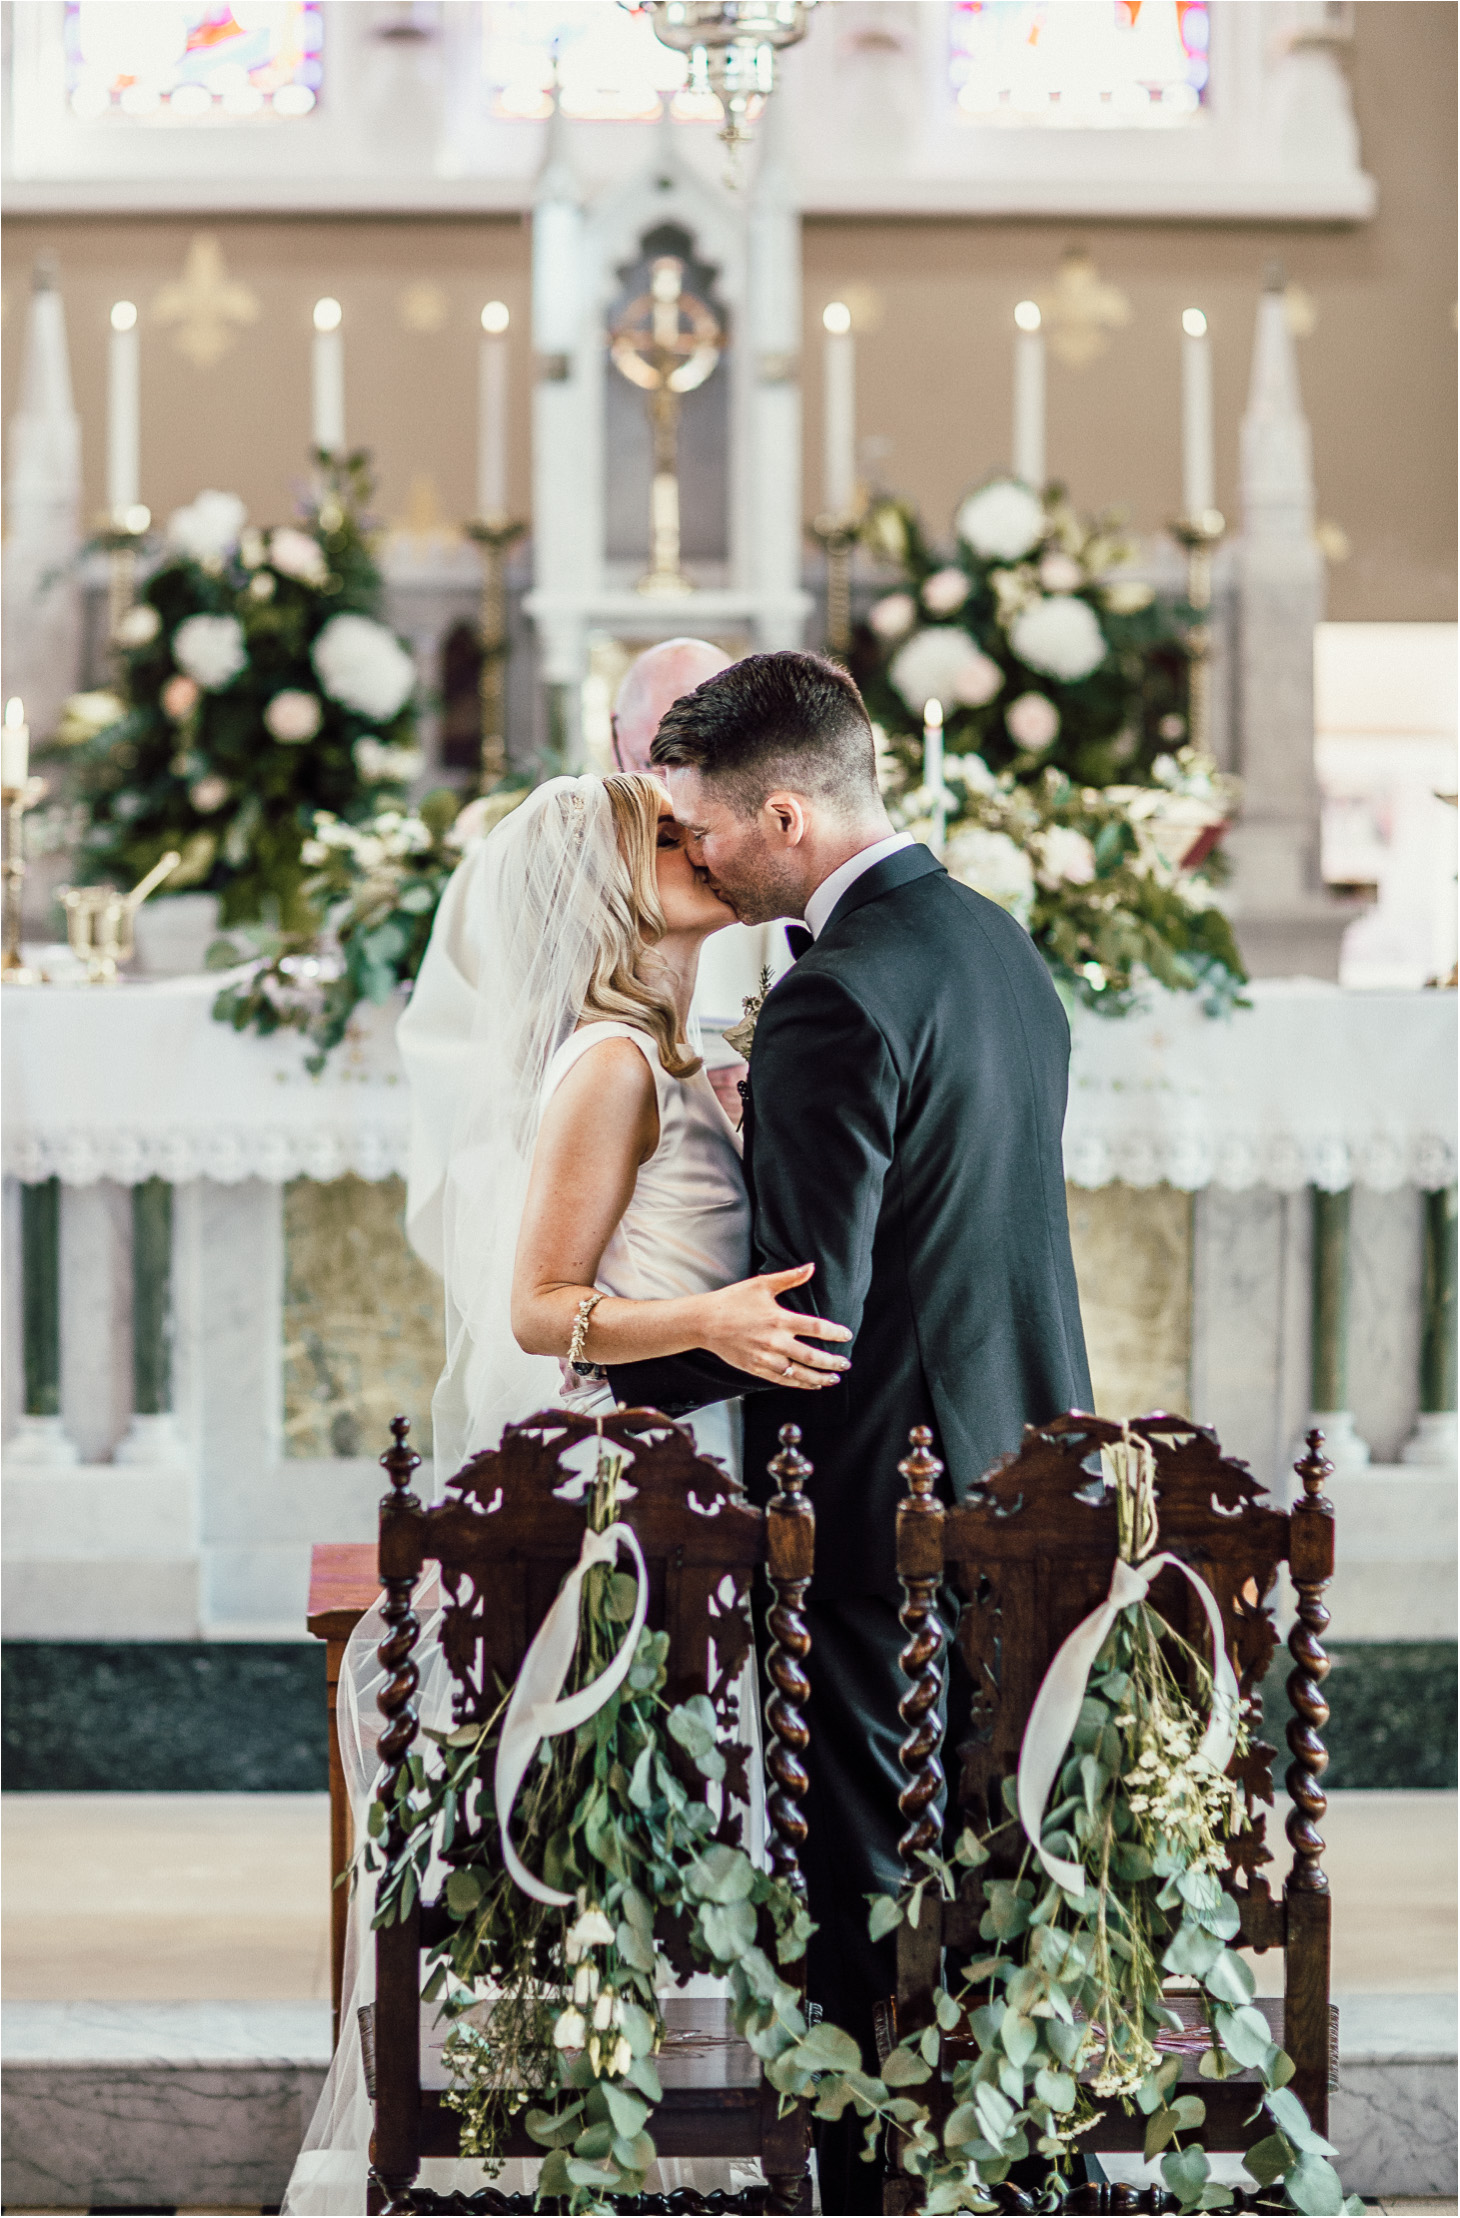 Virgina Lodge Photography. darren fitzpatrick. Wedding.10